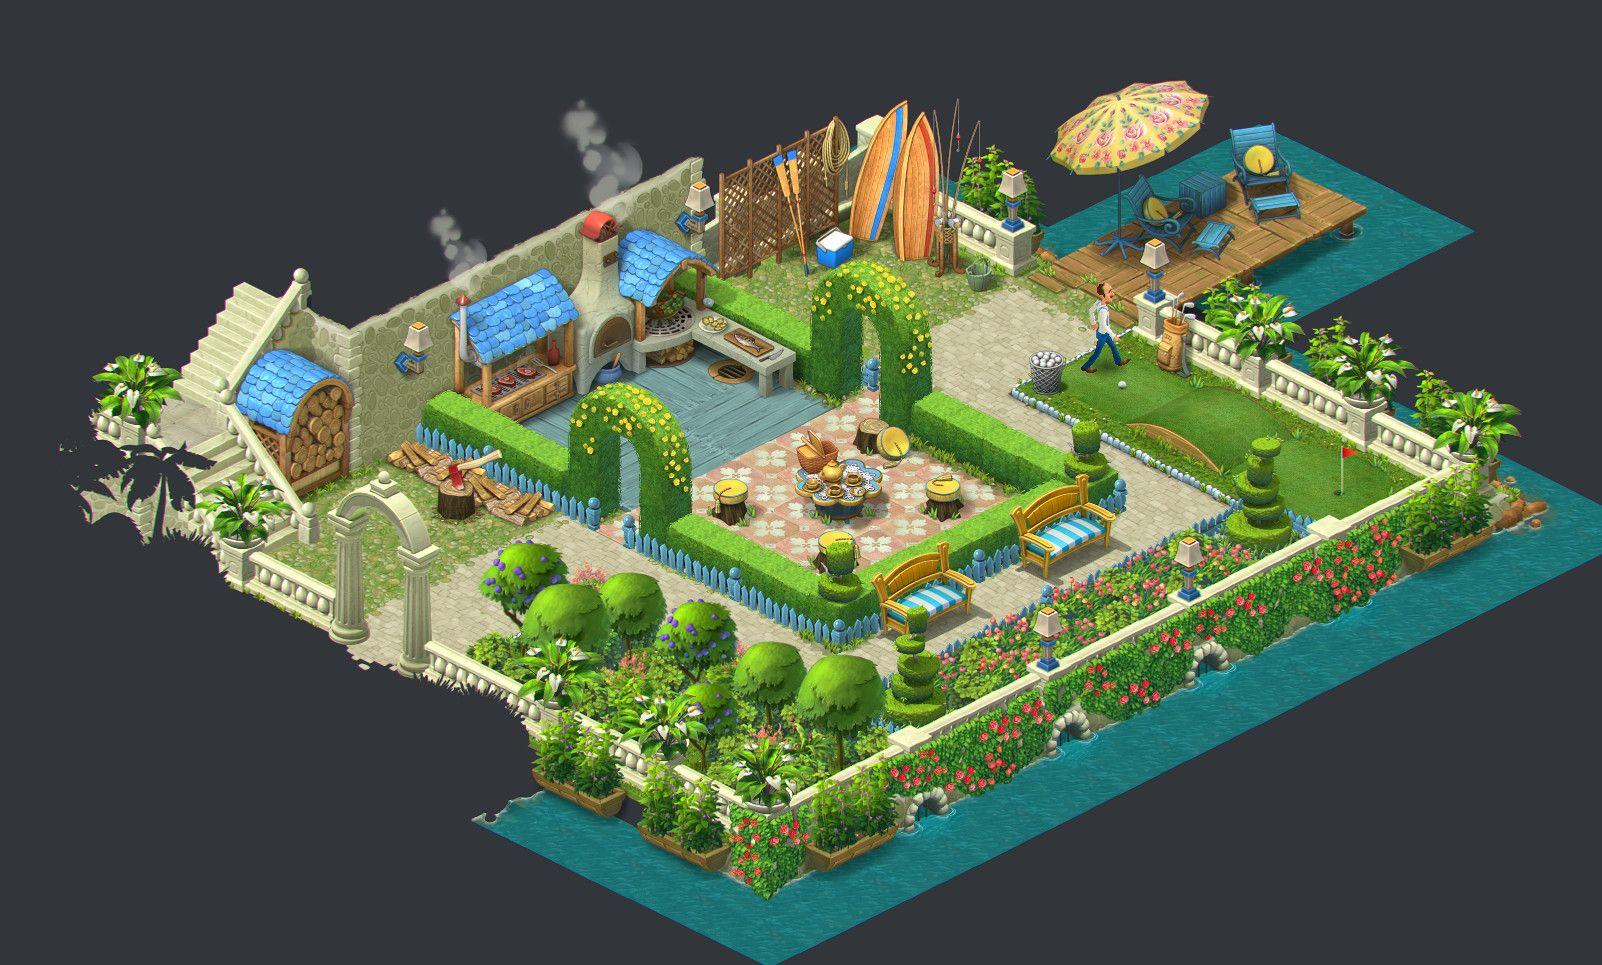 Artstation Gardenscapes New Acres Artdump Ilya Shigin Pinterest Game 2d 2d